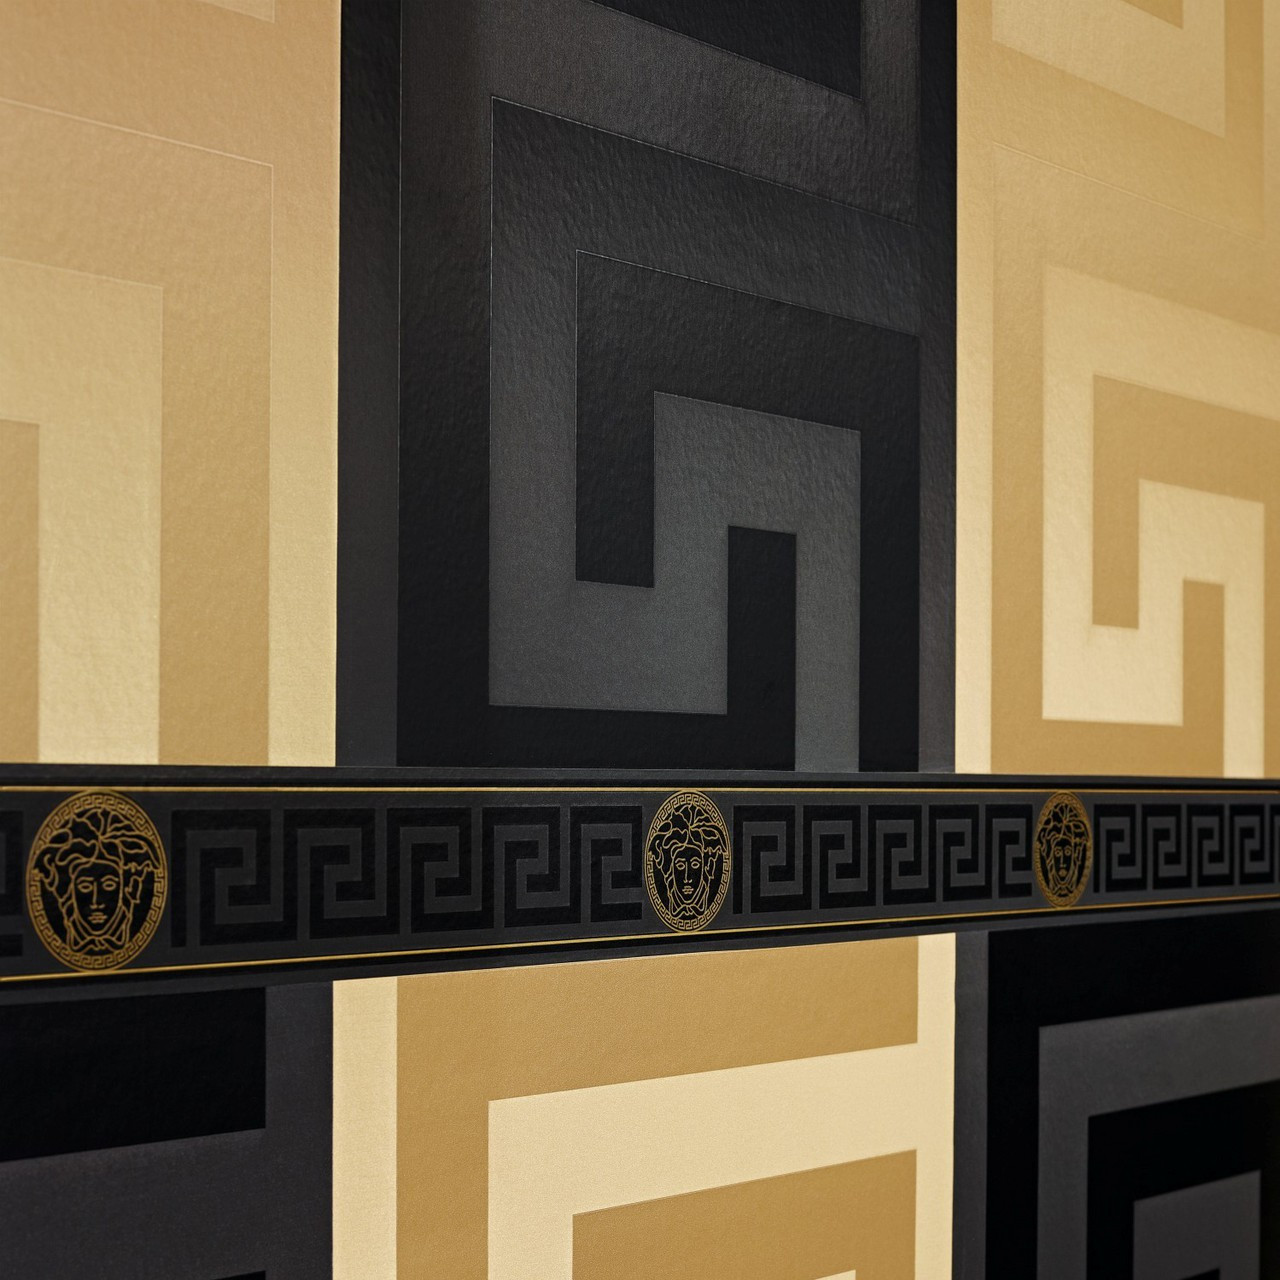 Greek key design wallpaper : Versace greek key black wallpaper as creation